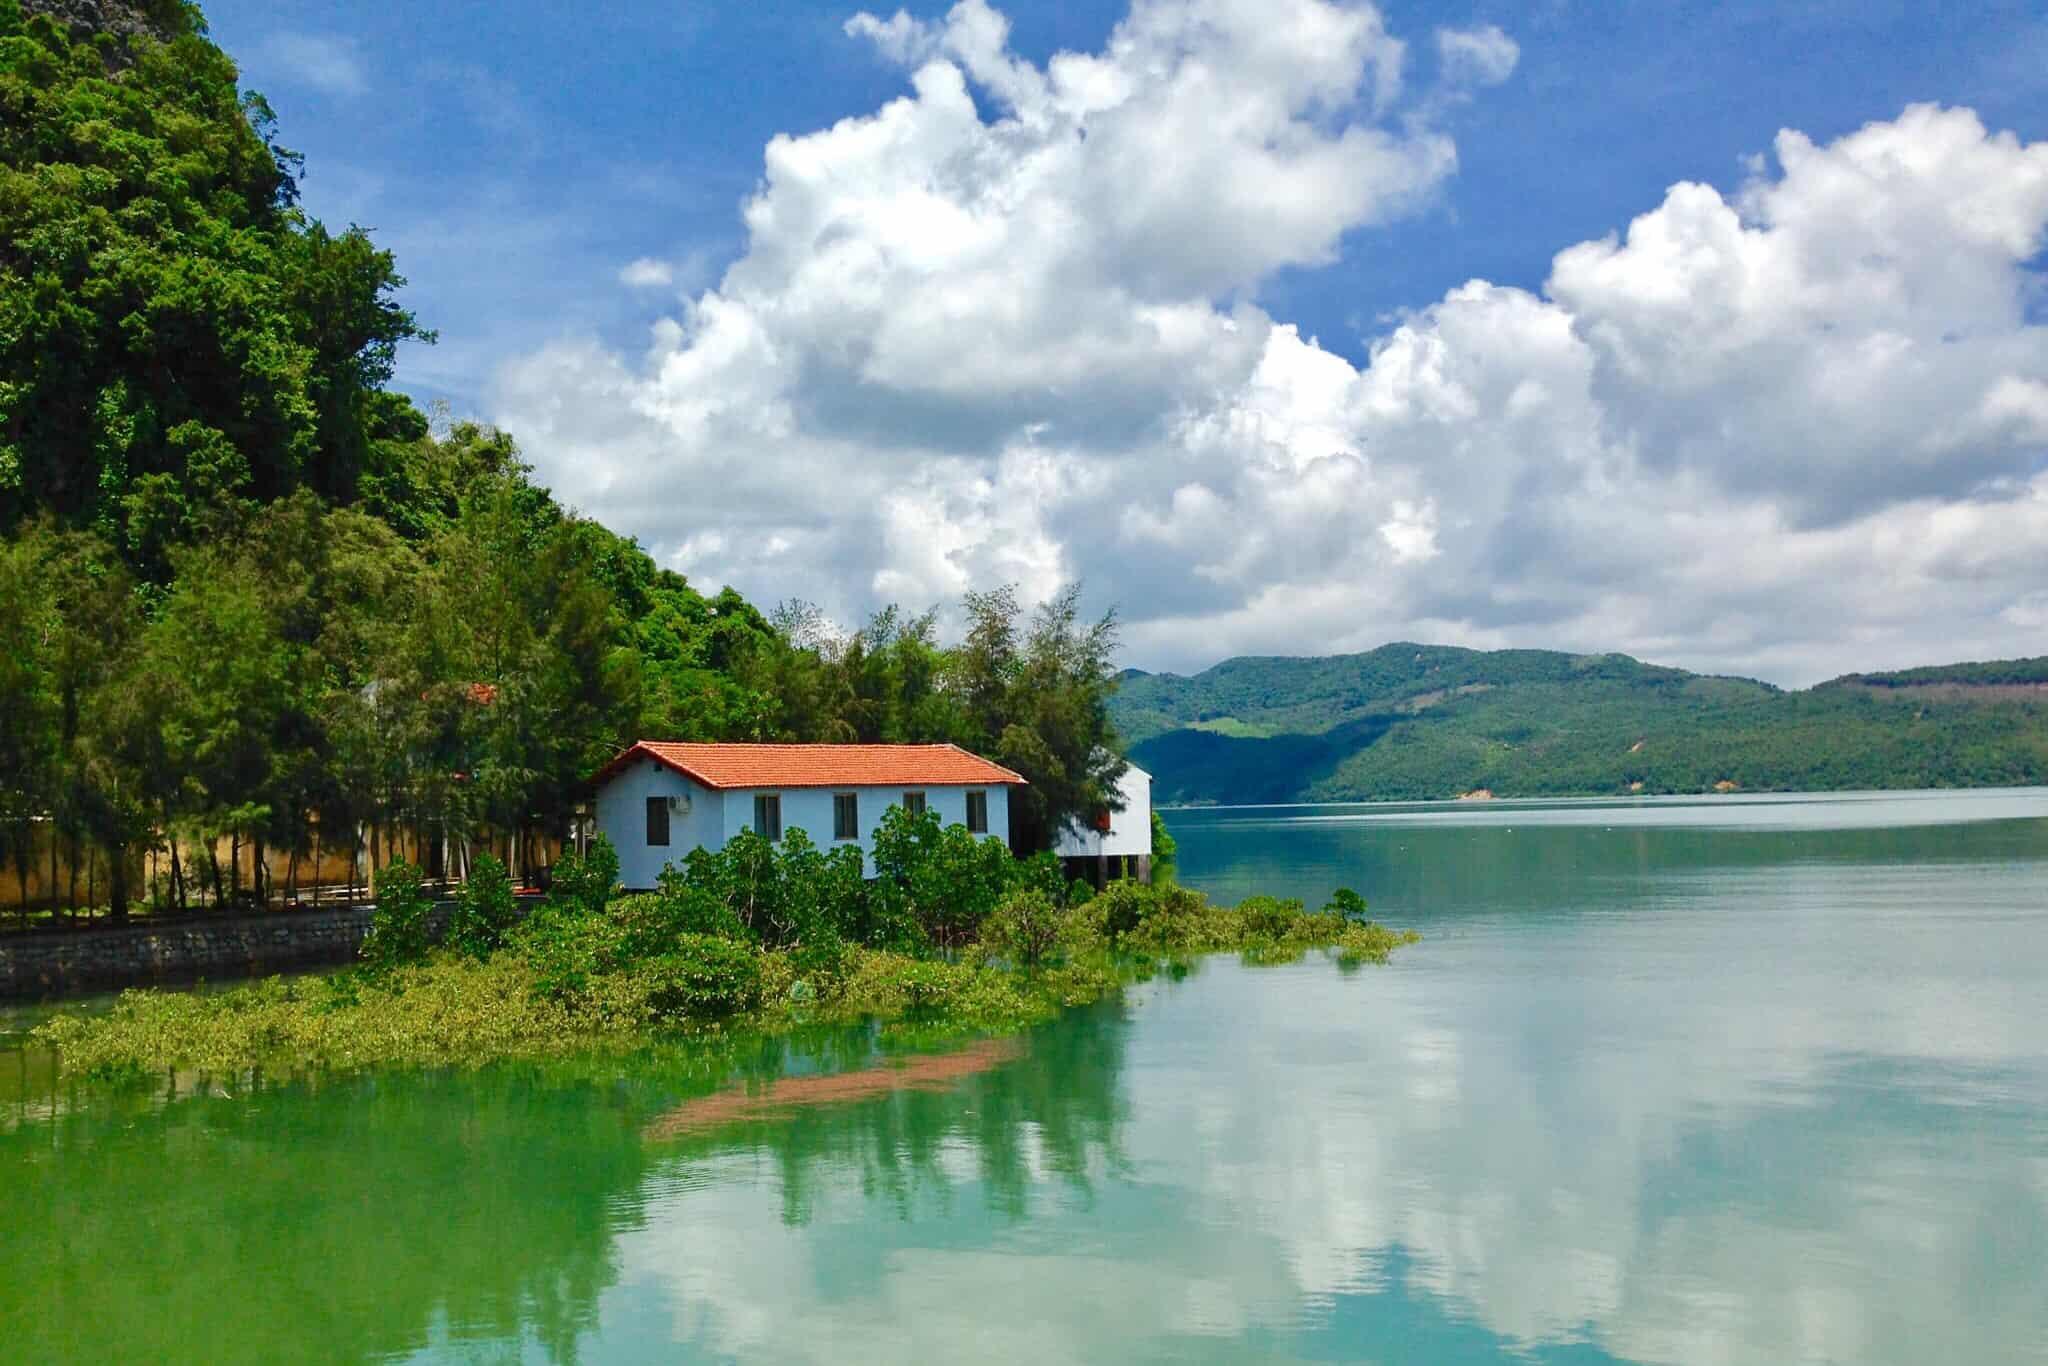 Beauty of Banh Sua island